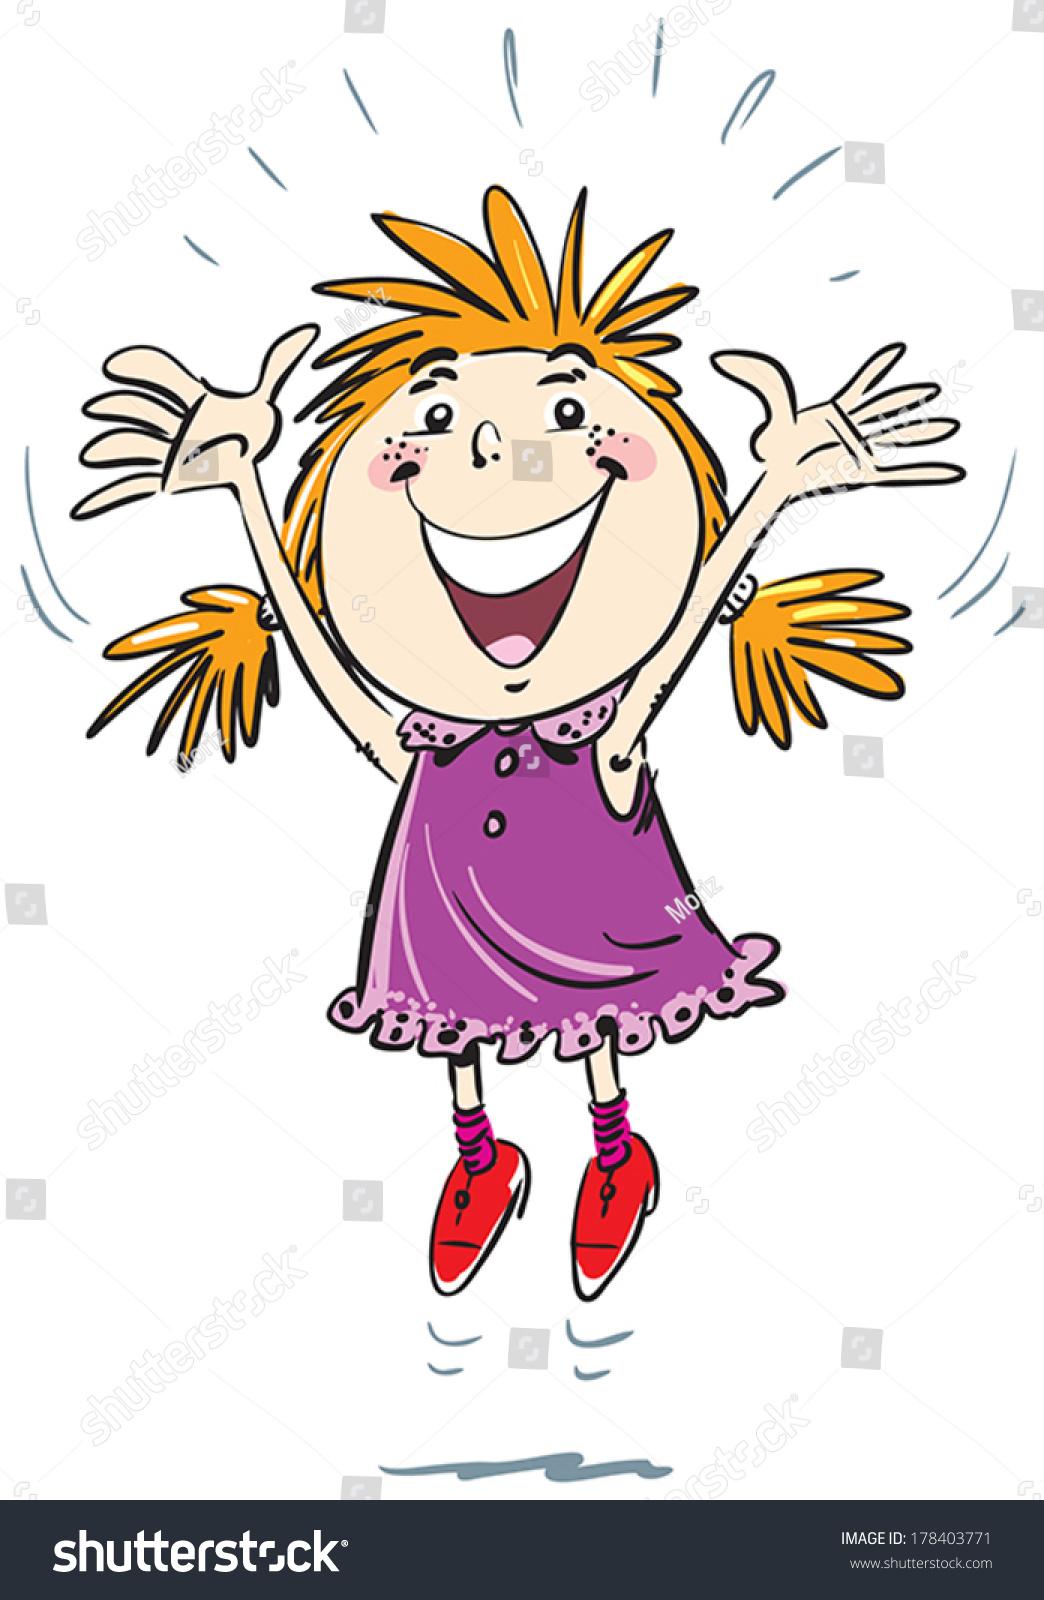 young girl jumping joy stock vector 178403771 shutterstock